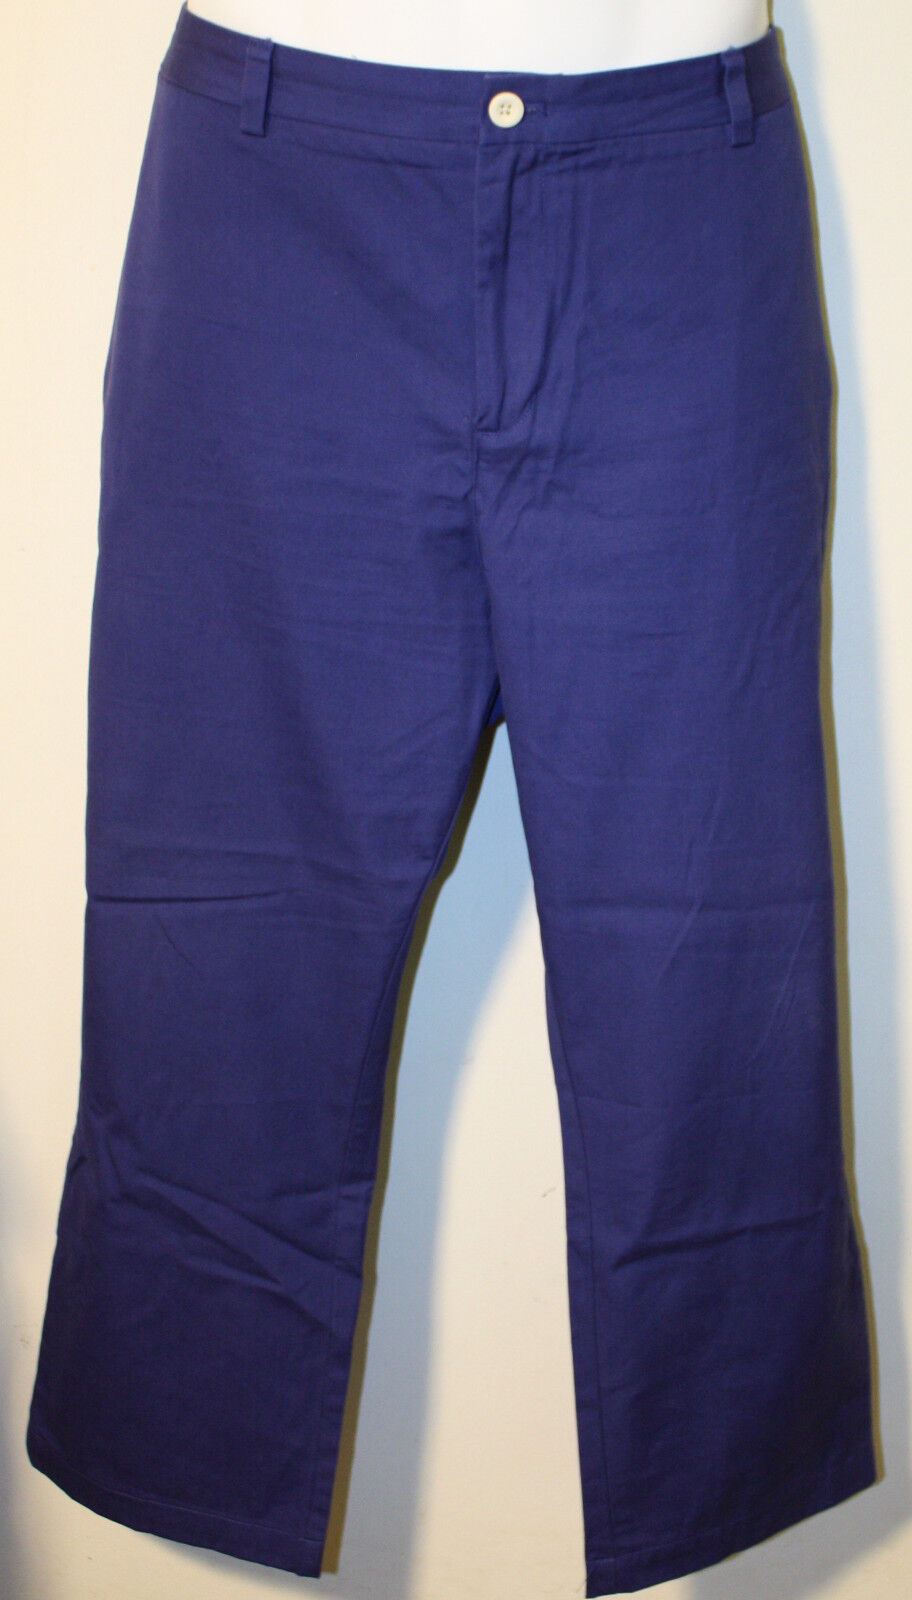 VINEYARD VINES Royal Cadet bluee Cotton Slim Fit Breaker Pants 40 x 27